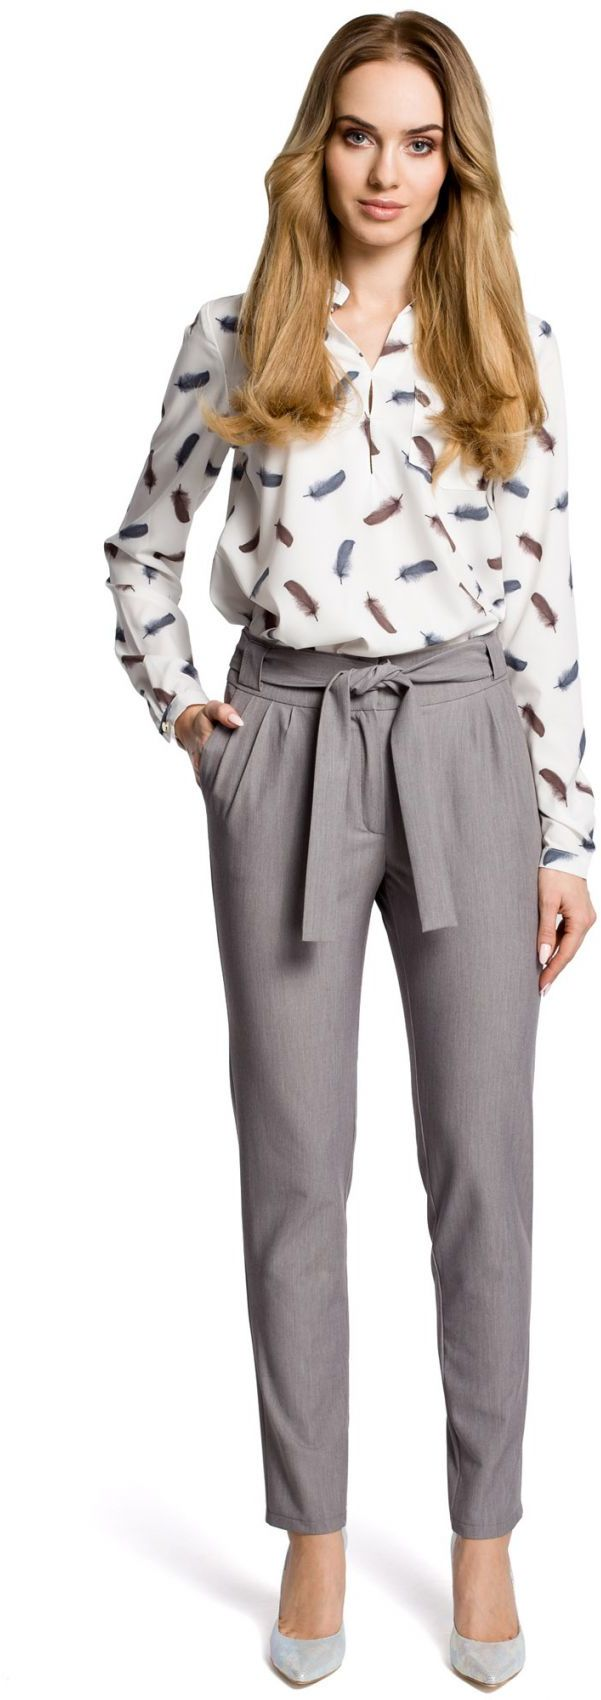 M363 Spodnie chino z paskiem szare